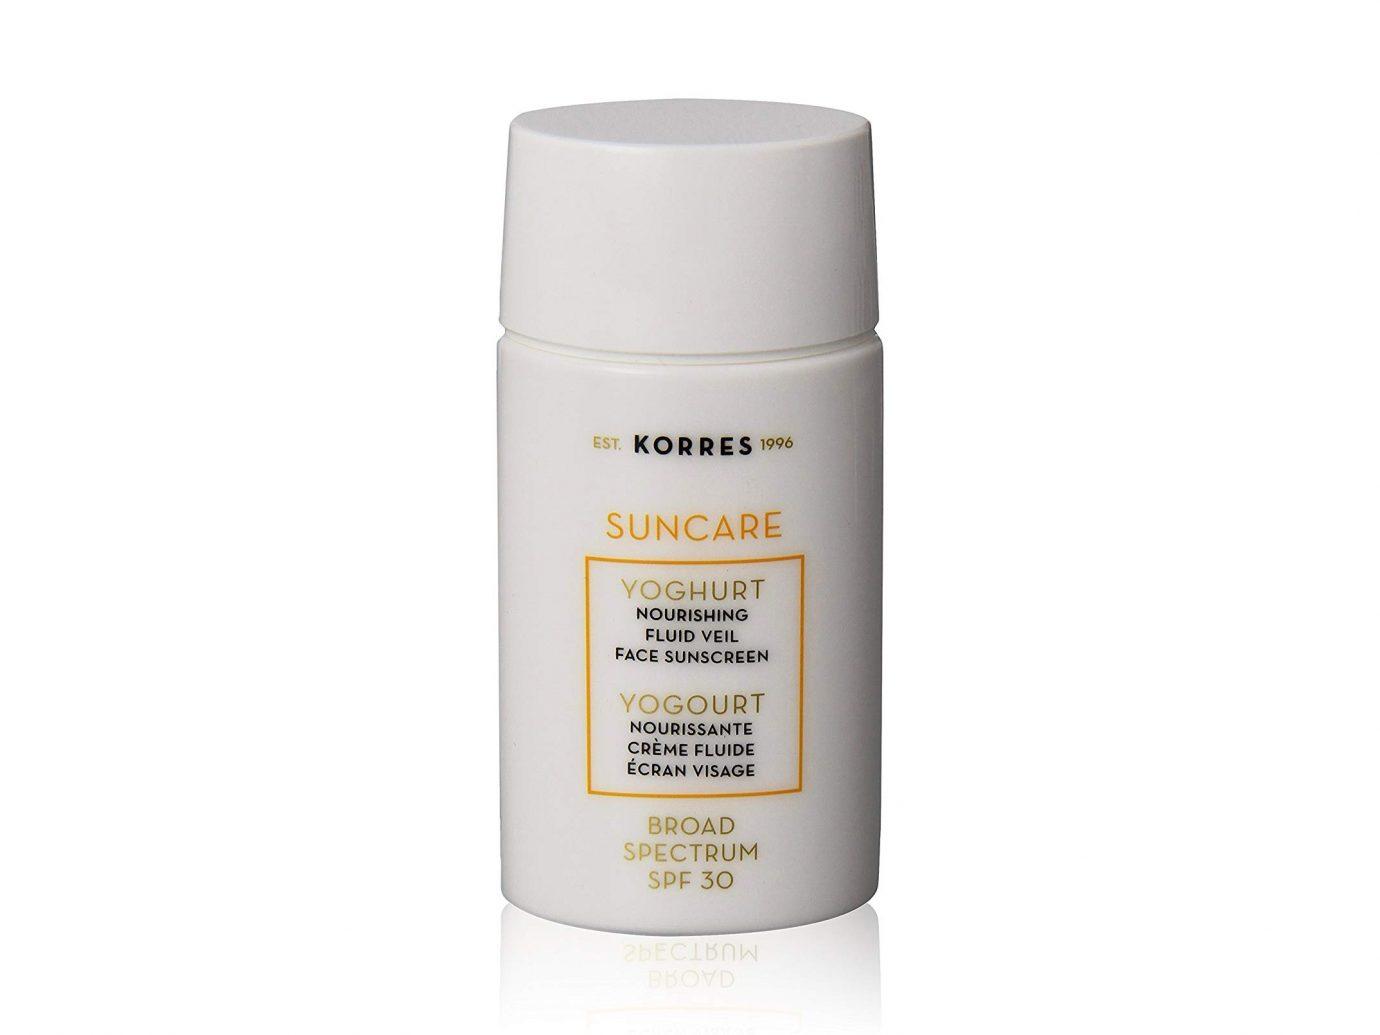 Korres Yoghurt Nourishing Fluid Veil Face Sunscreen Broad Spectrum SPF 30